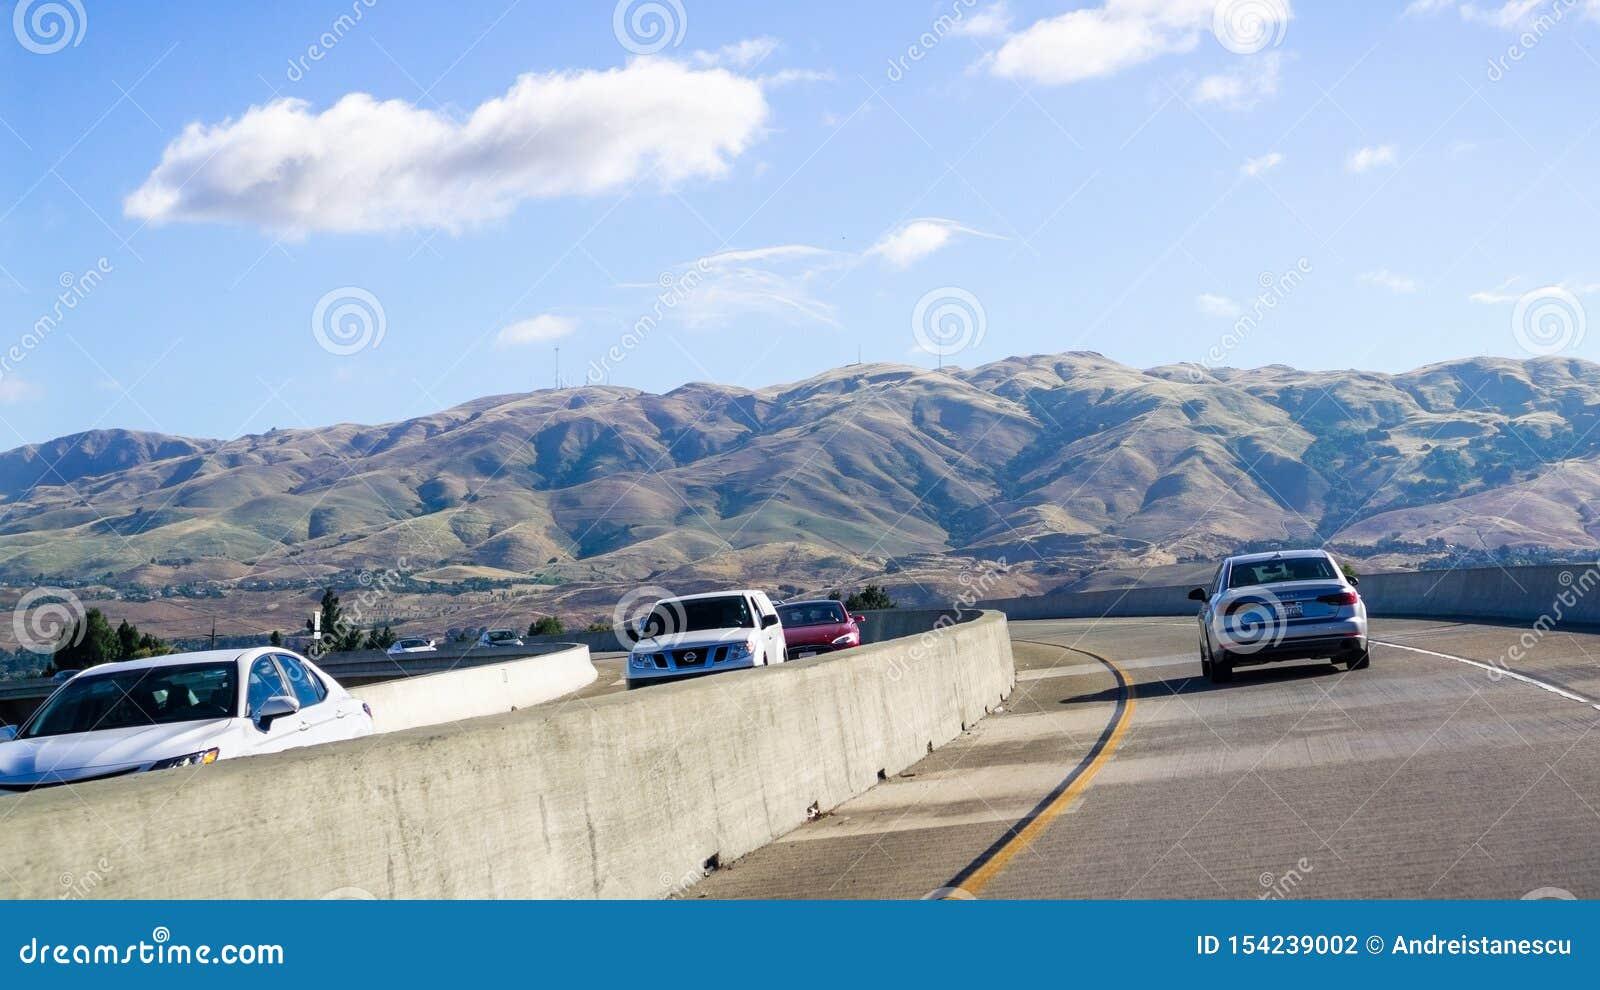 Express Lane California >> June 26 2019 Milpitas Ca Usa Driving On The Express